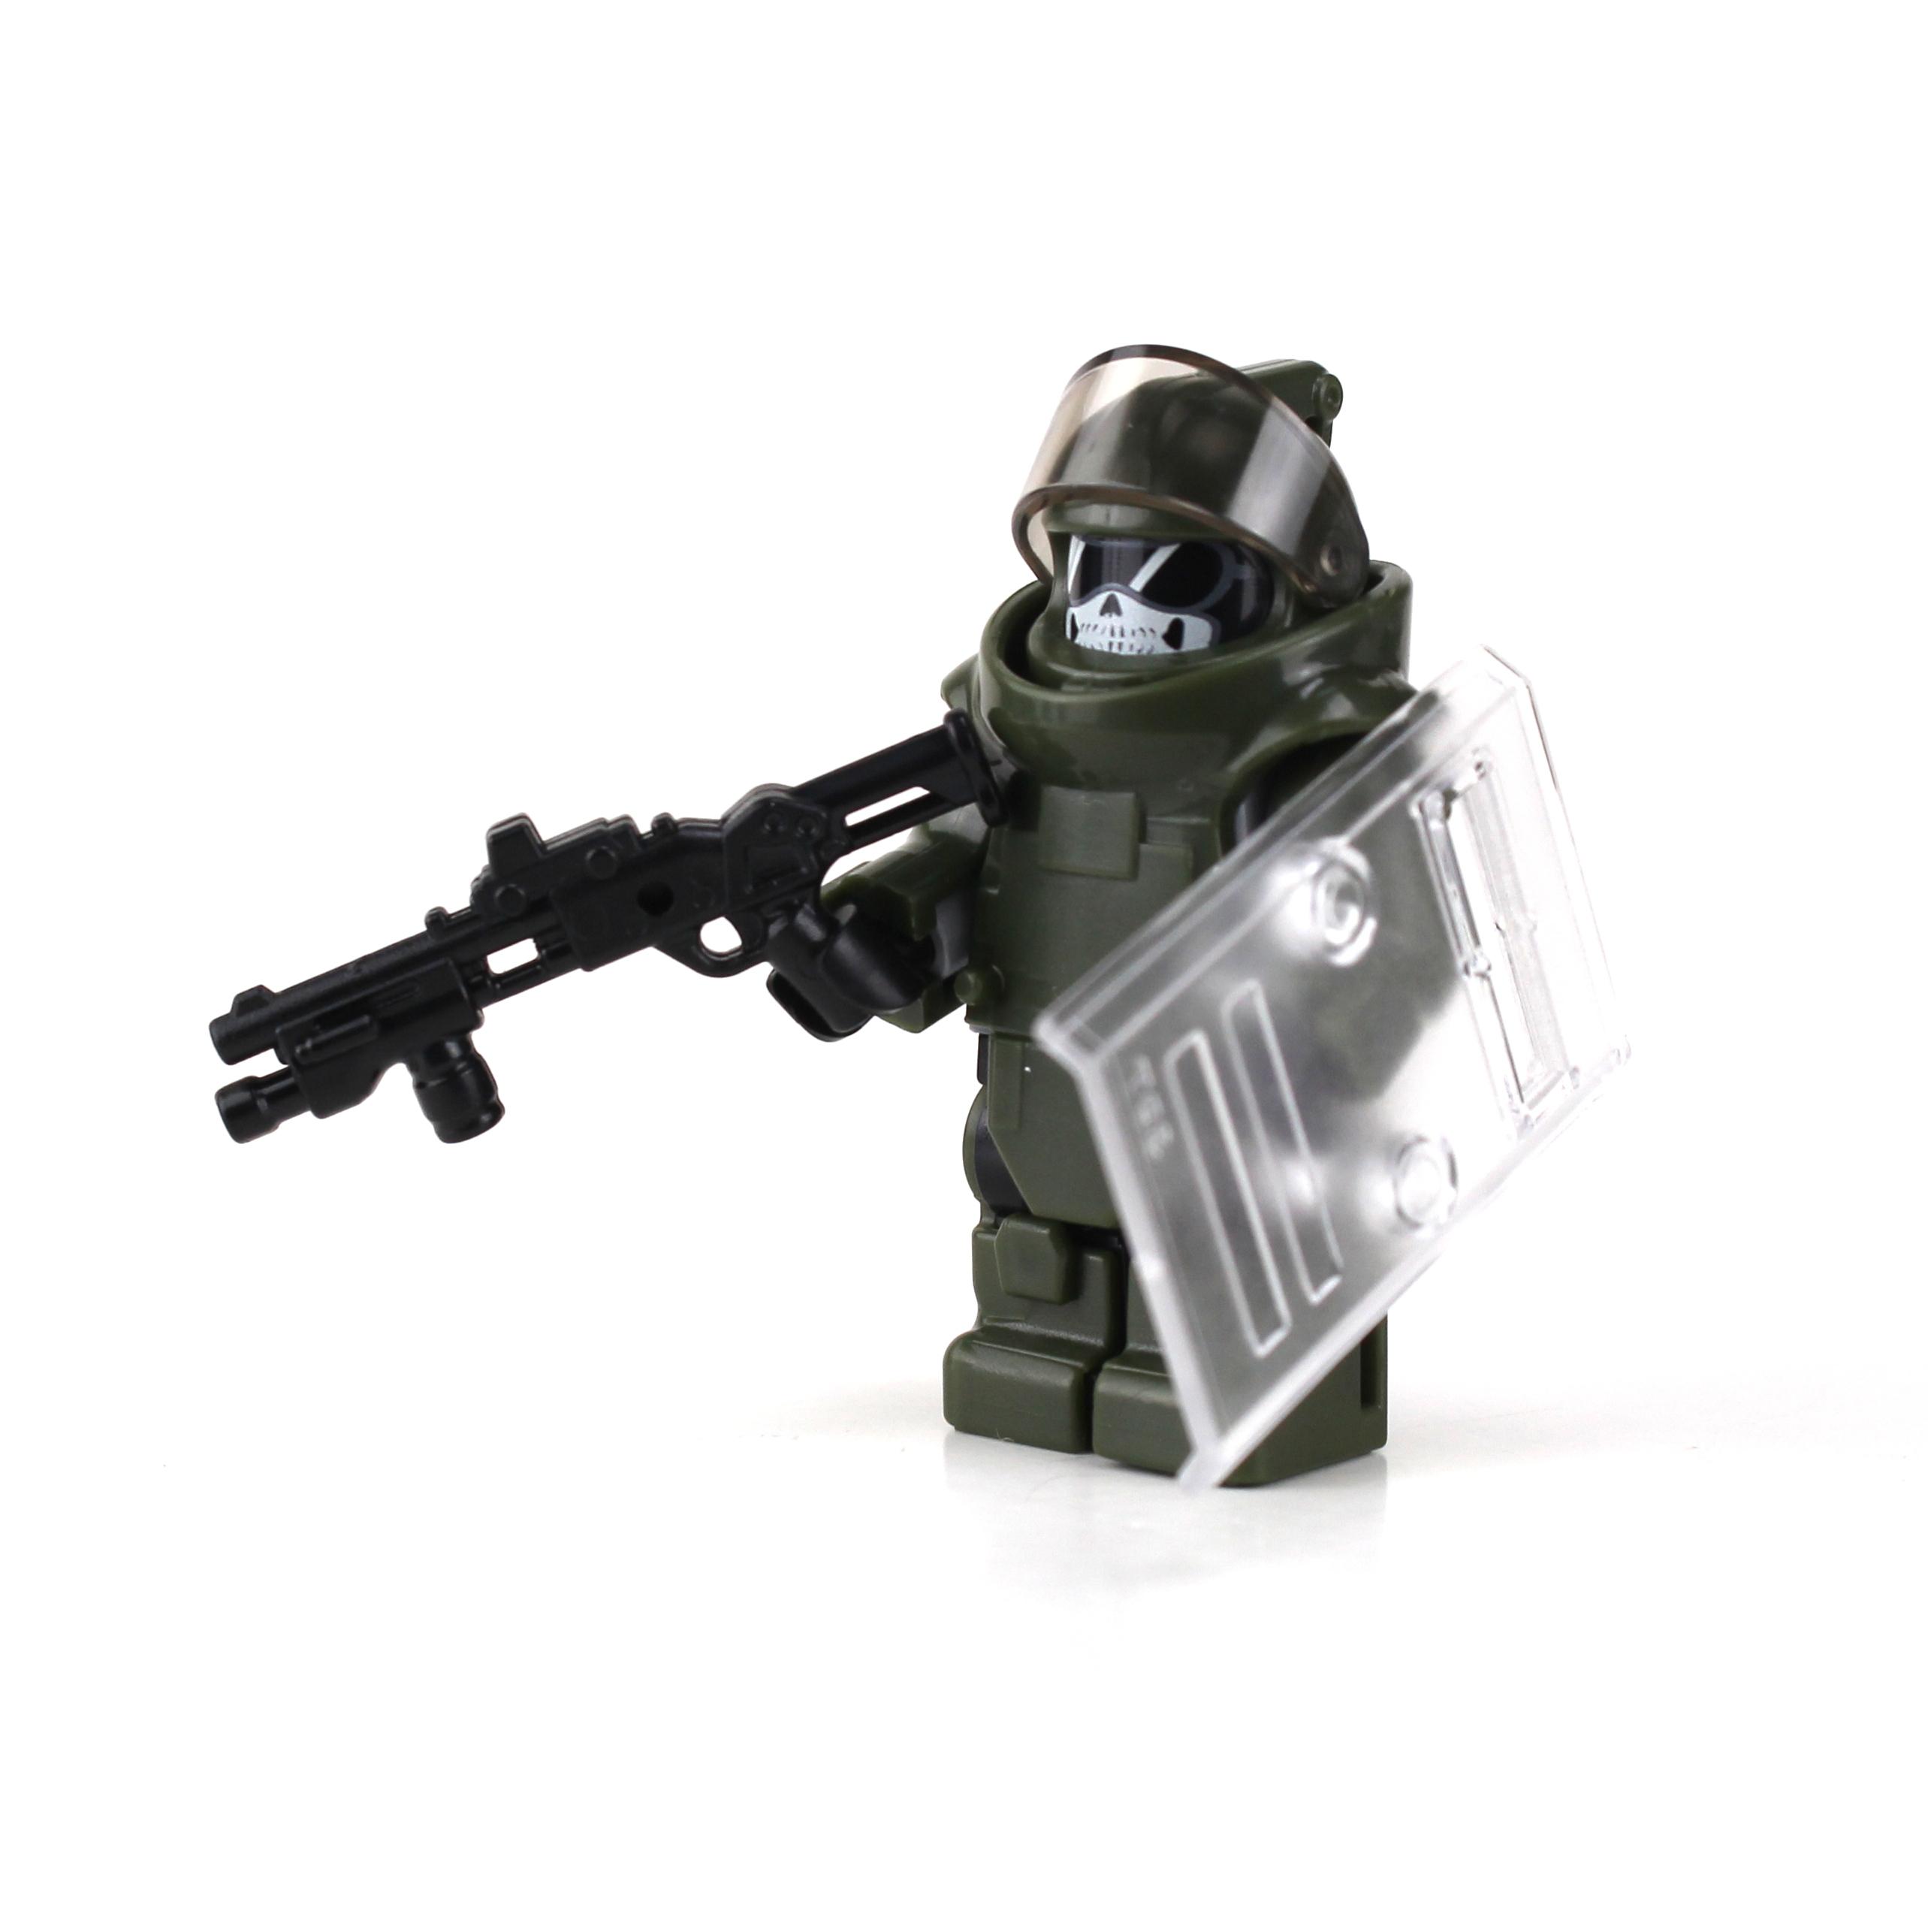 Value Juggernaut Army Assault Minifigure